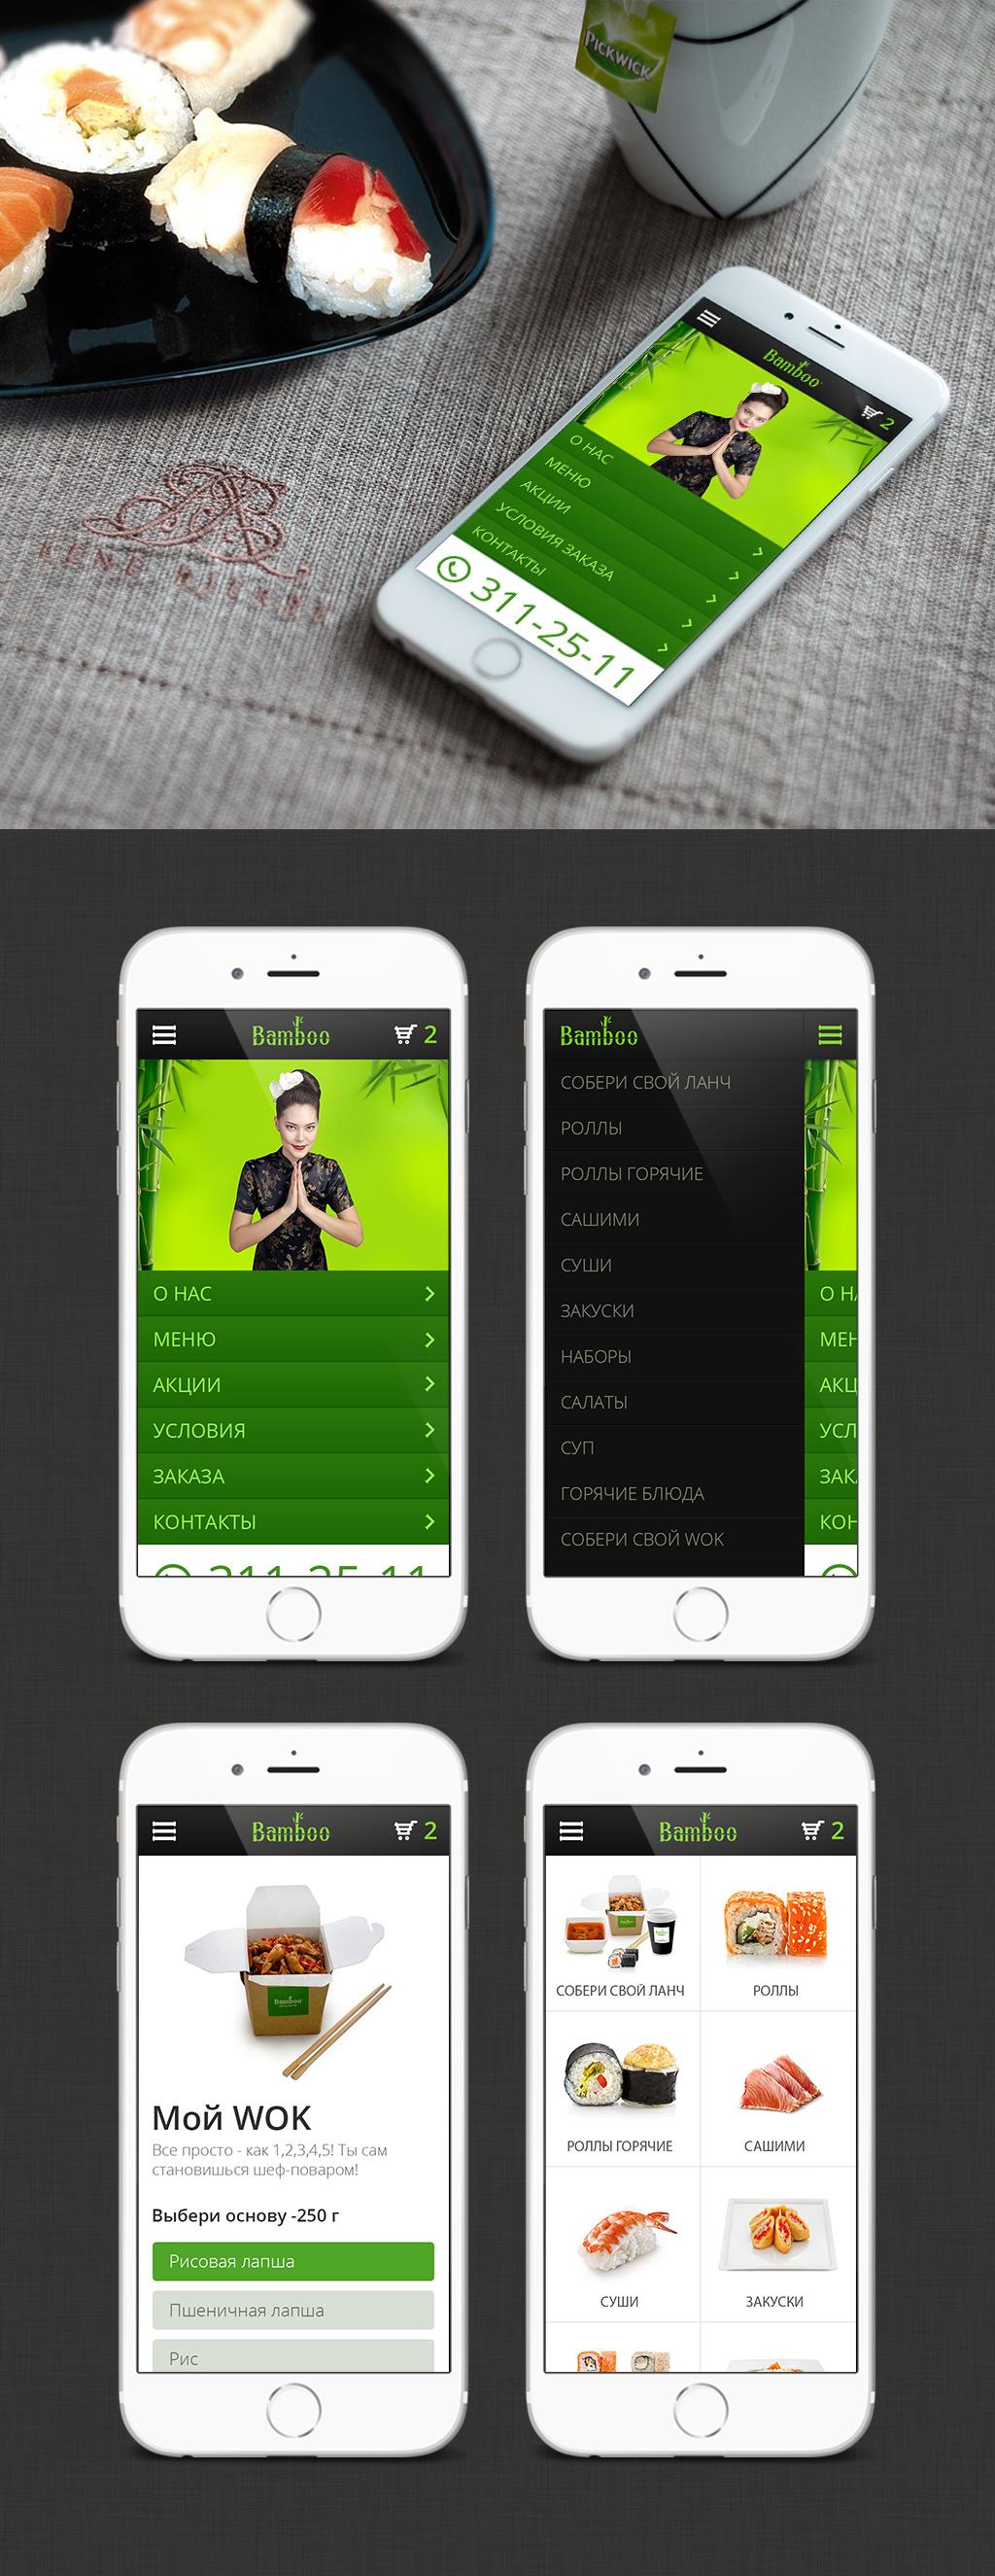 Bamboo-Express - Магазин в формате «Take away» (мобильная версия)